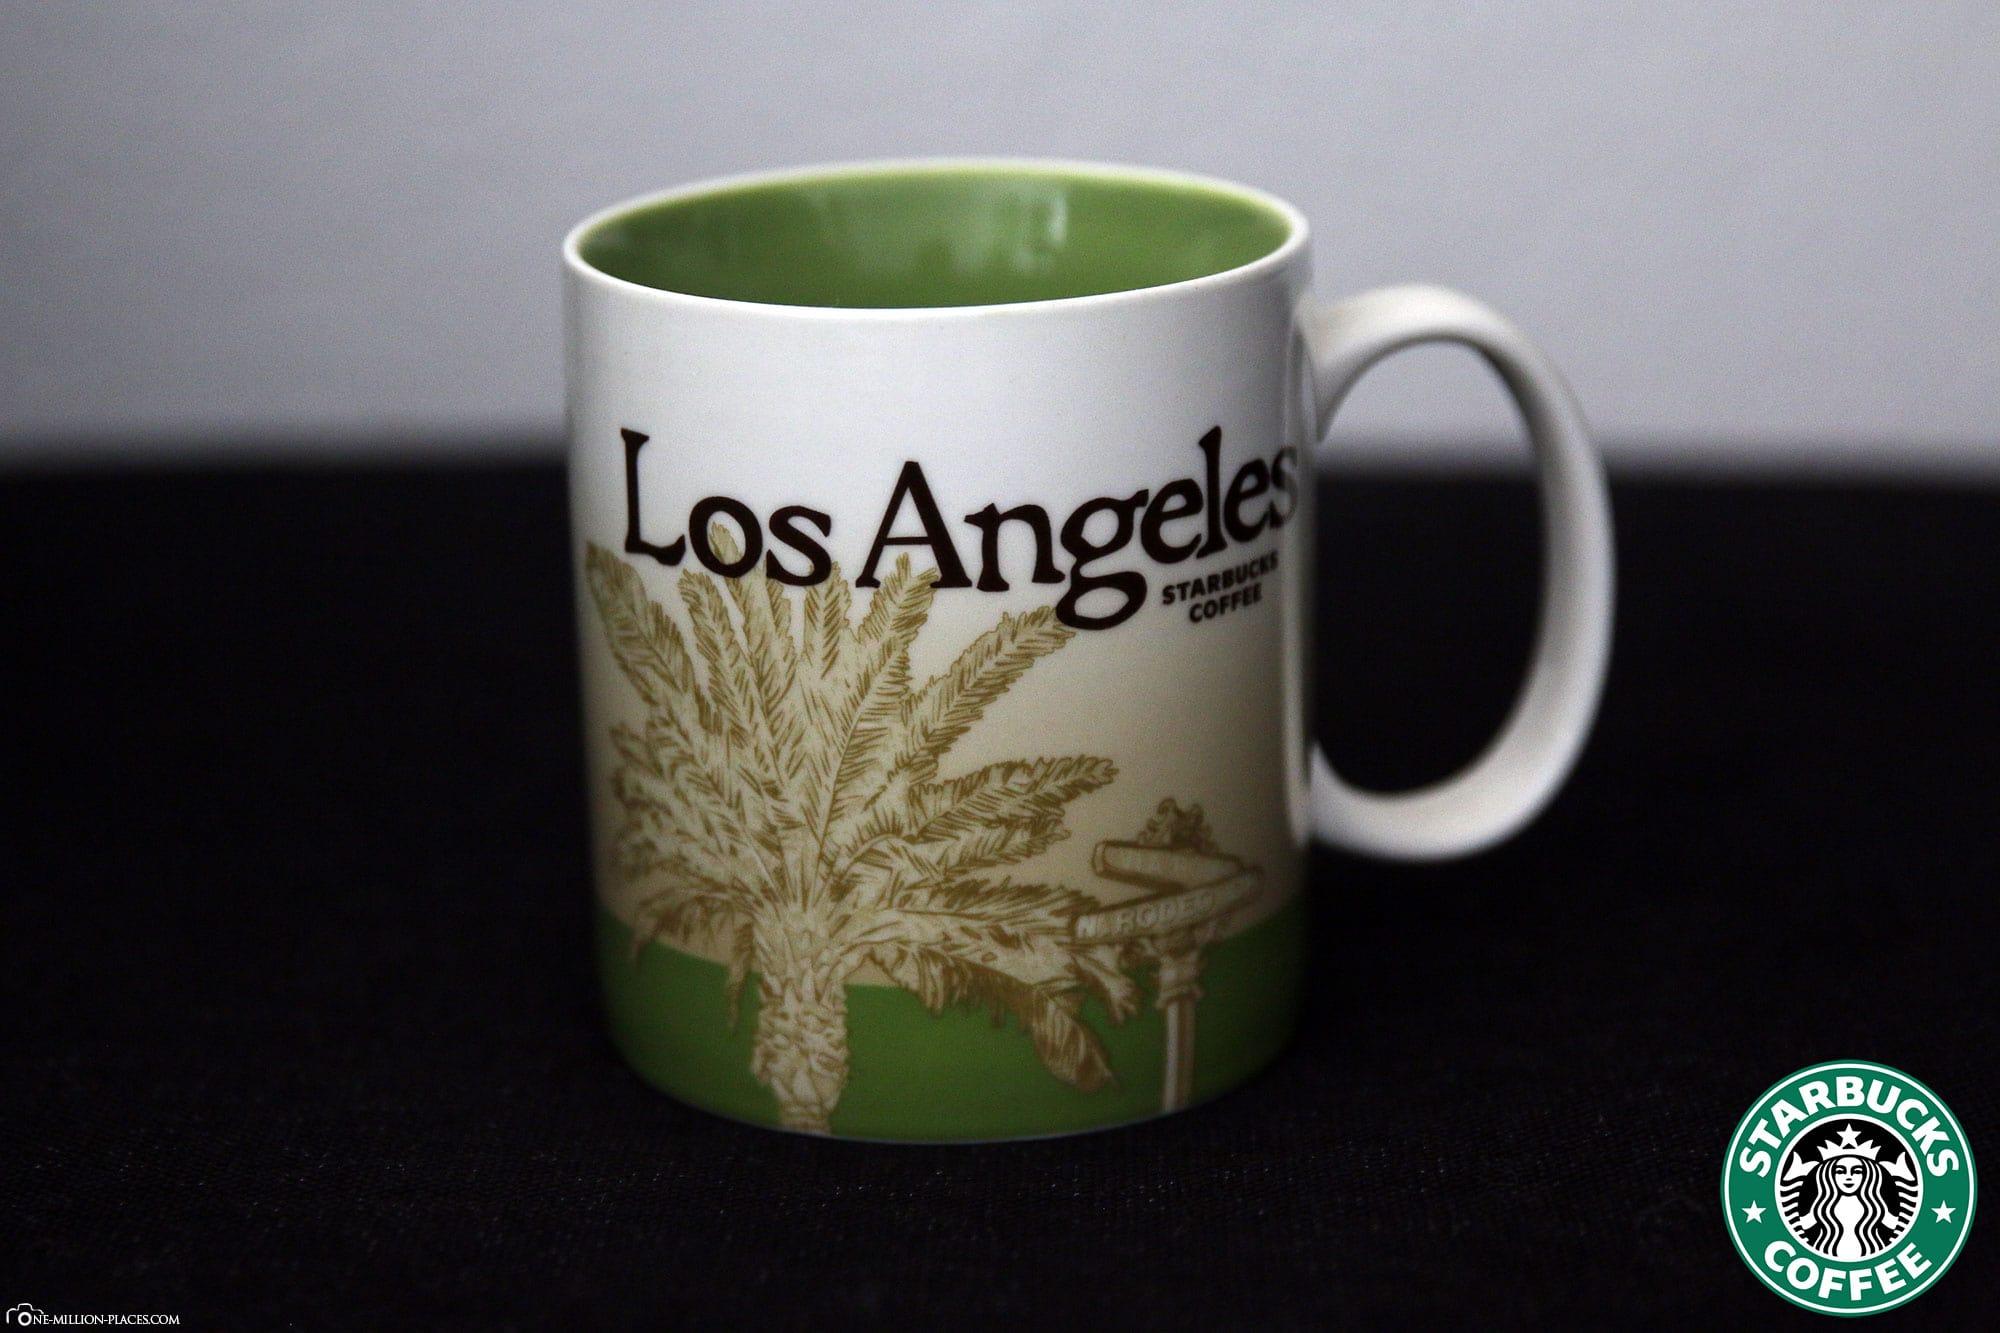 Los Angeles, Starbucks Tasse, Global Icon Serie, City Mugs, Sammlung, USA, Reisebericht